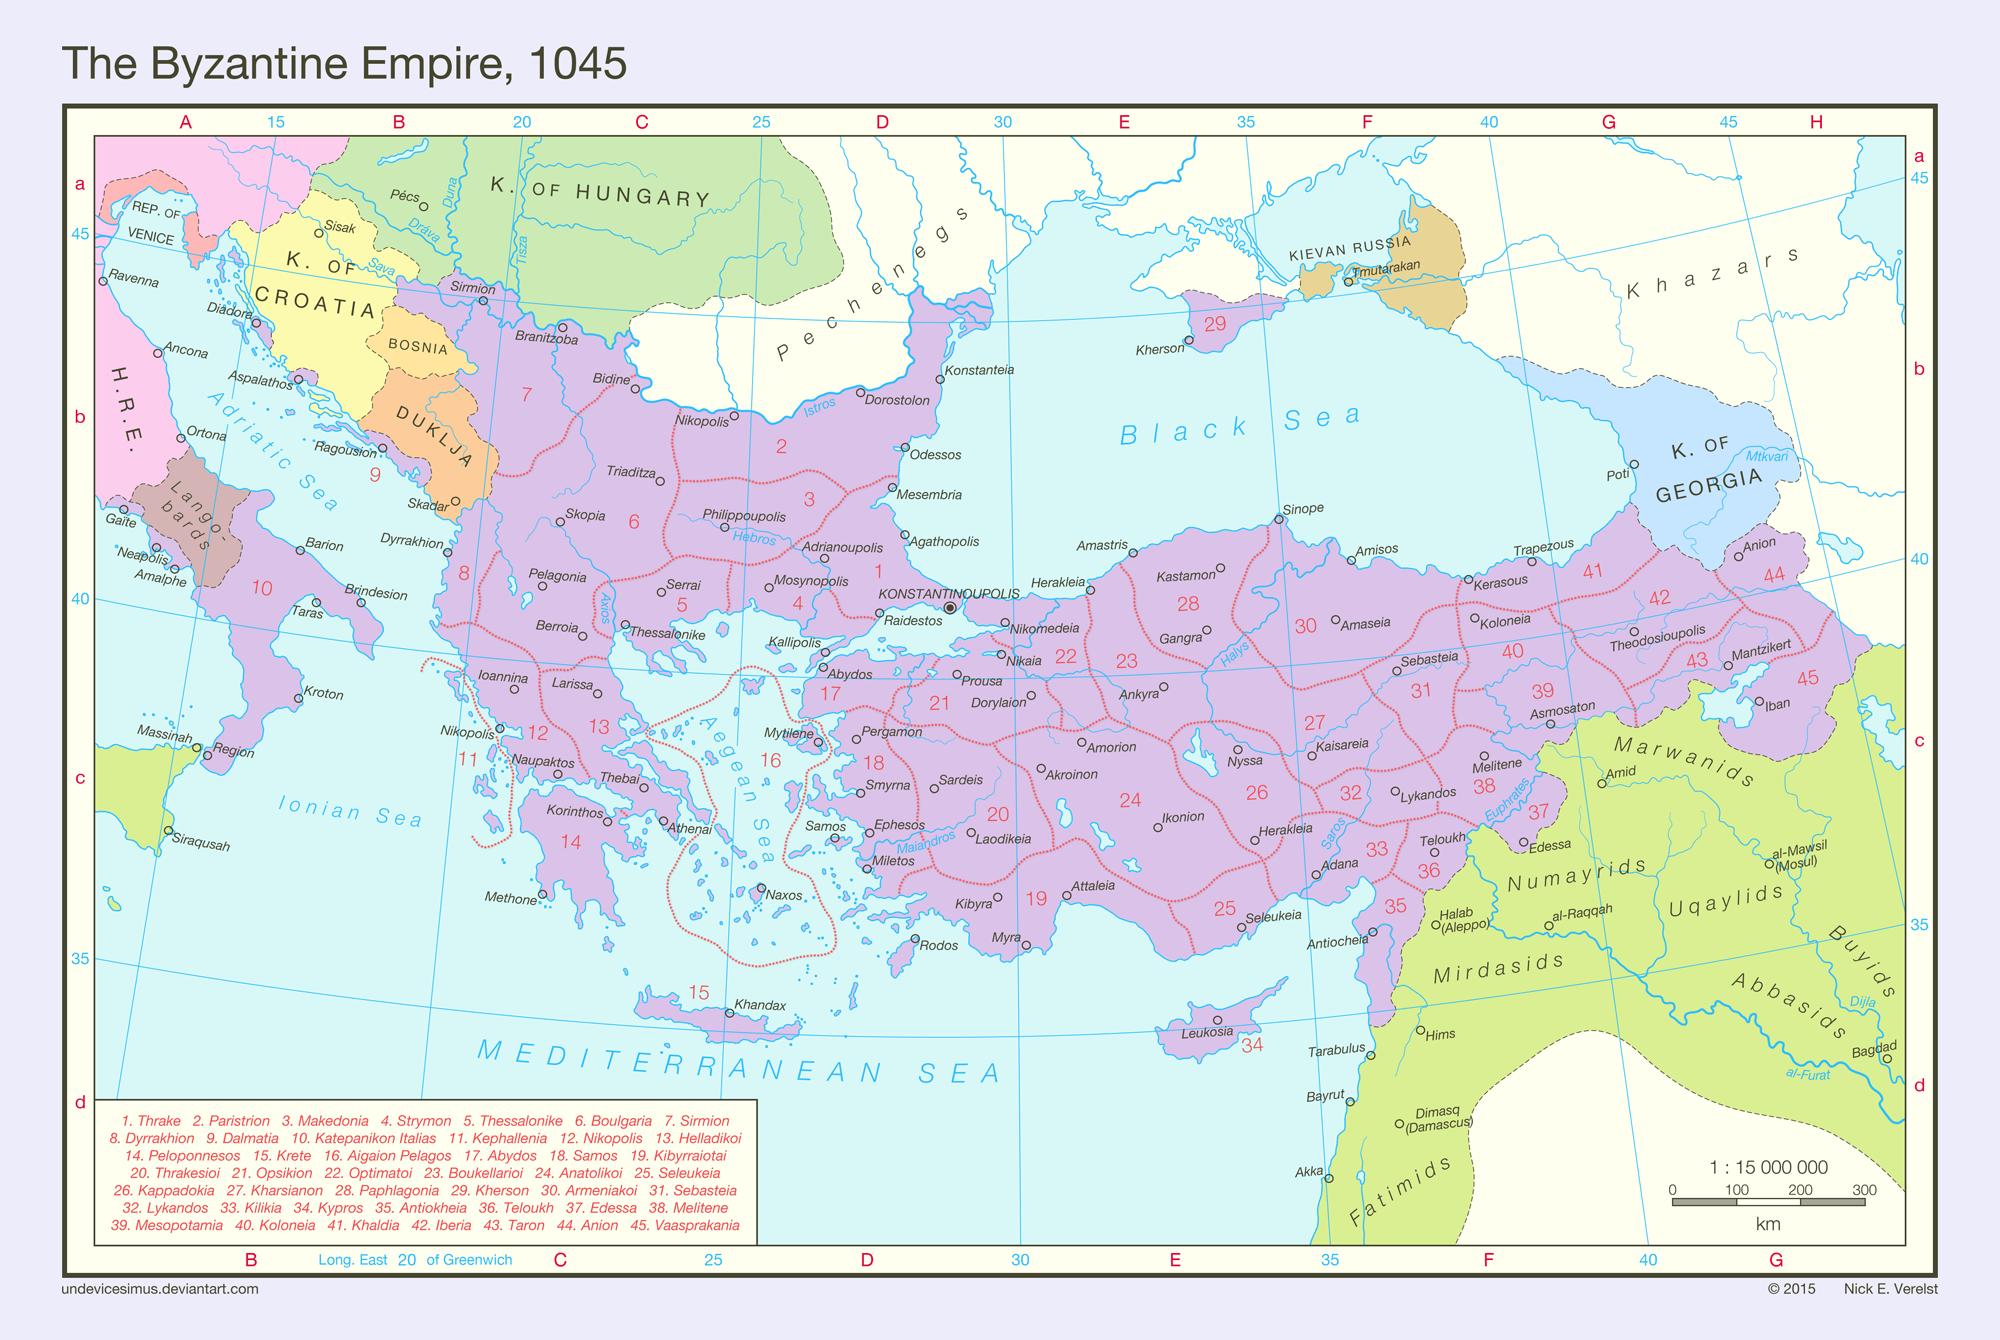 The Byzantine Empire, 1045 by Undevicesimus on DeviantArt